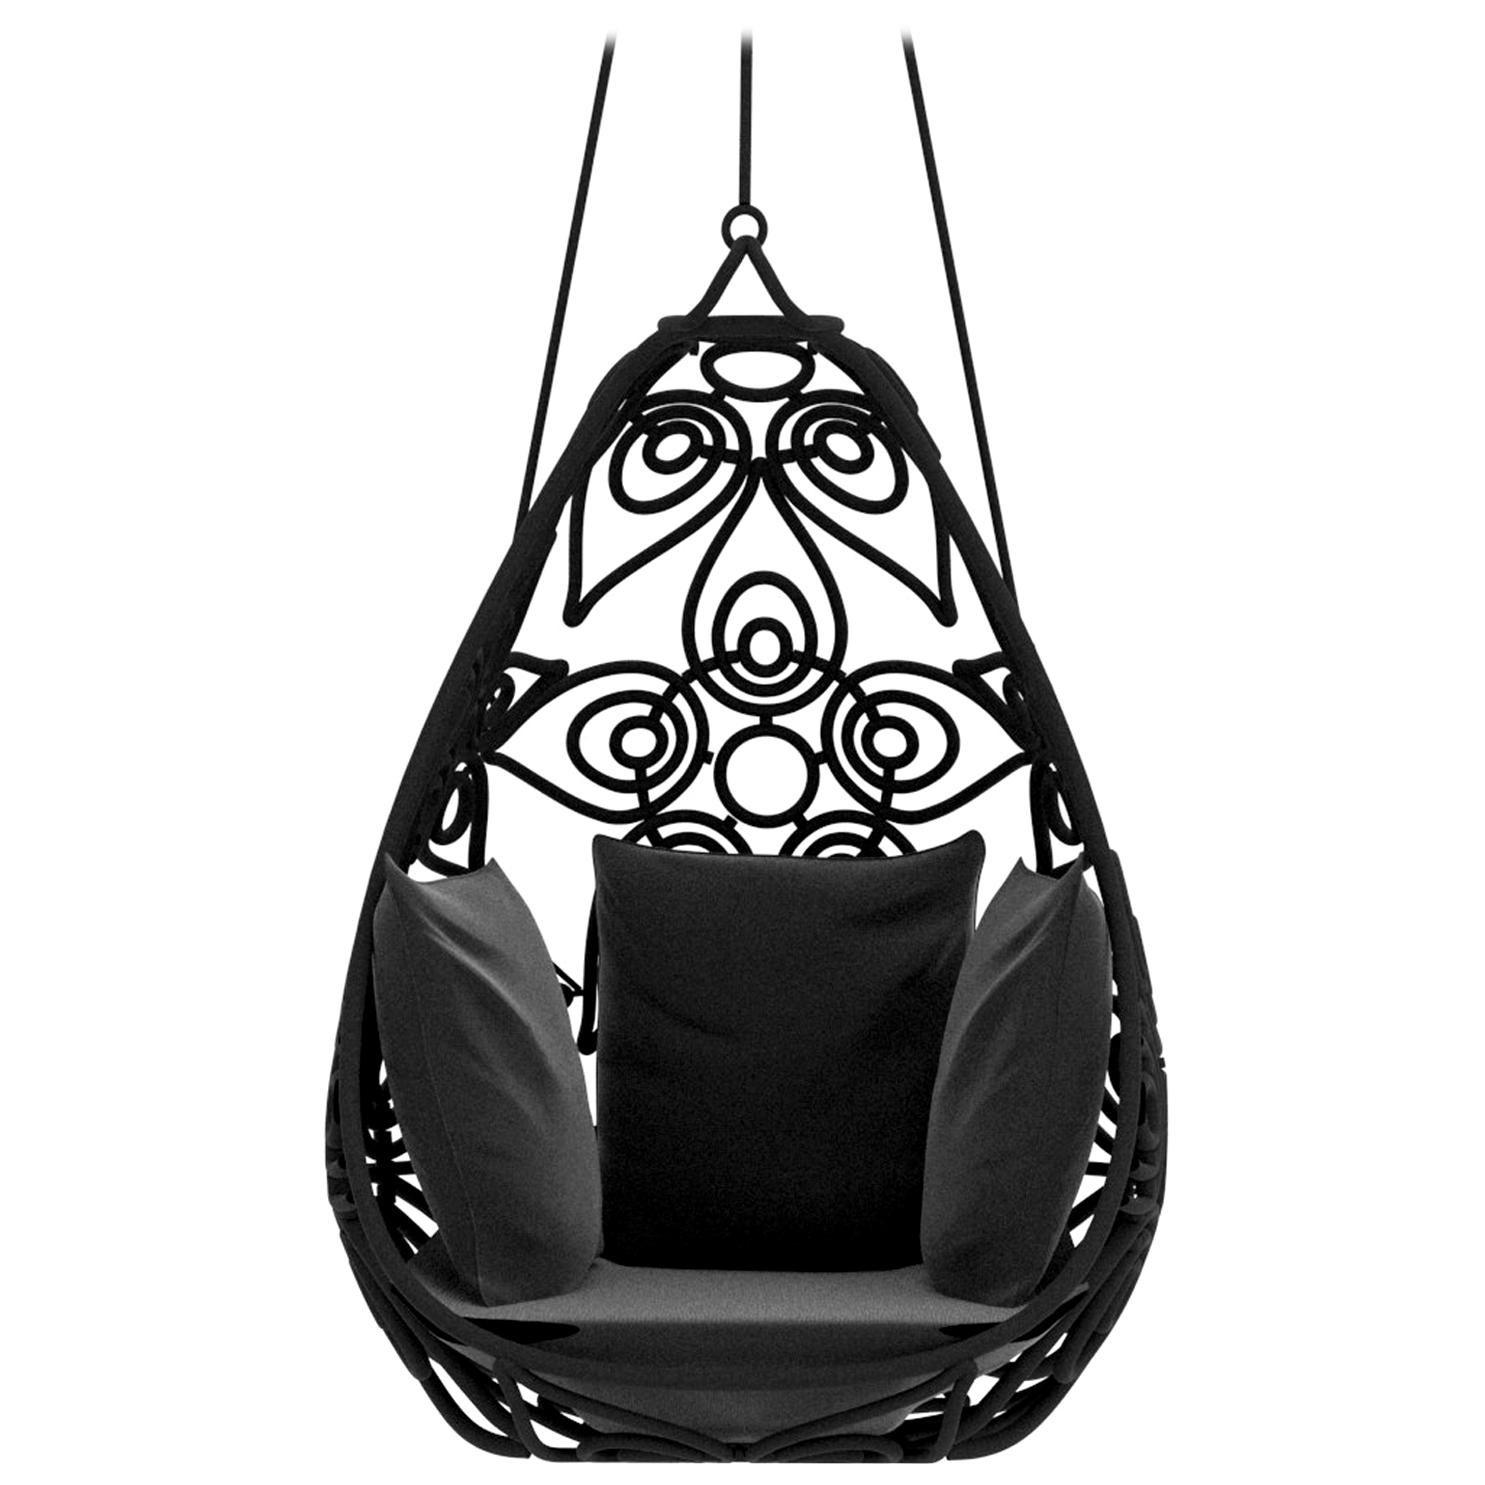 Chita Swing - Available in NY